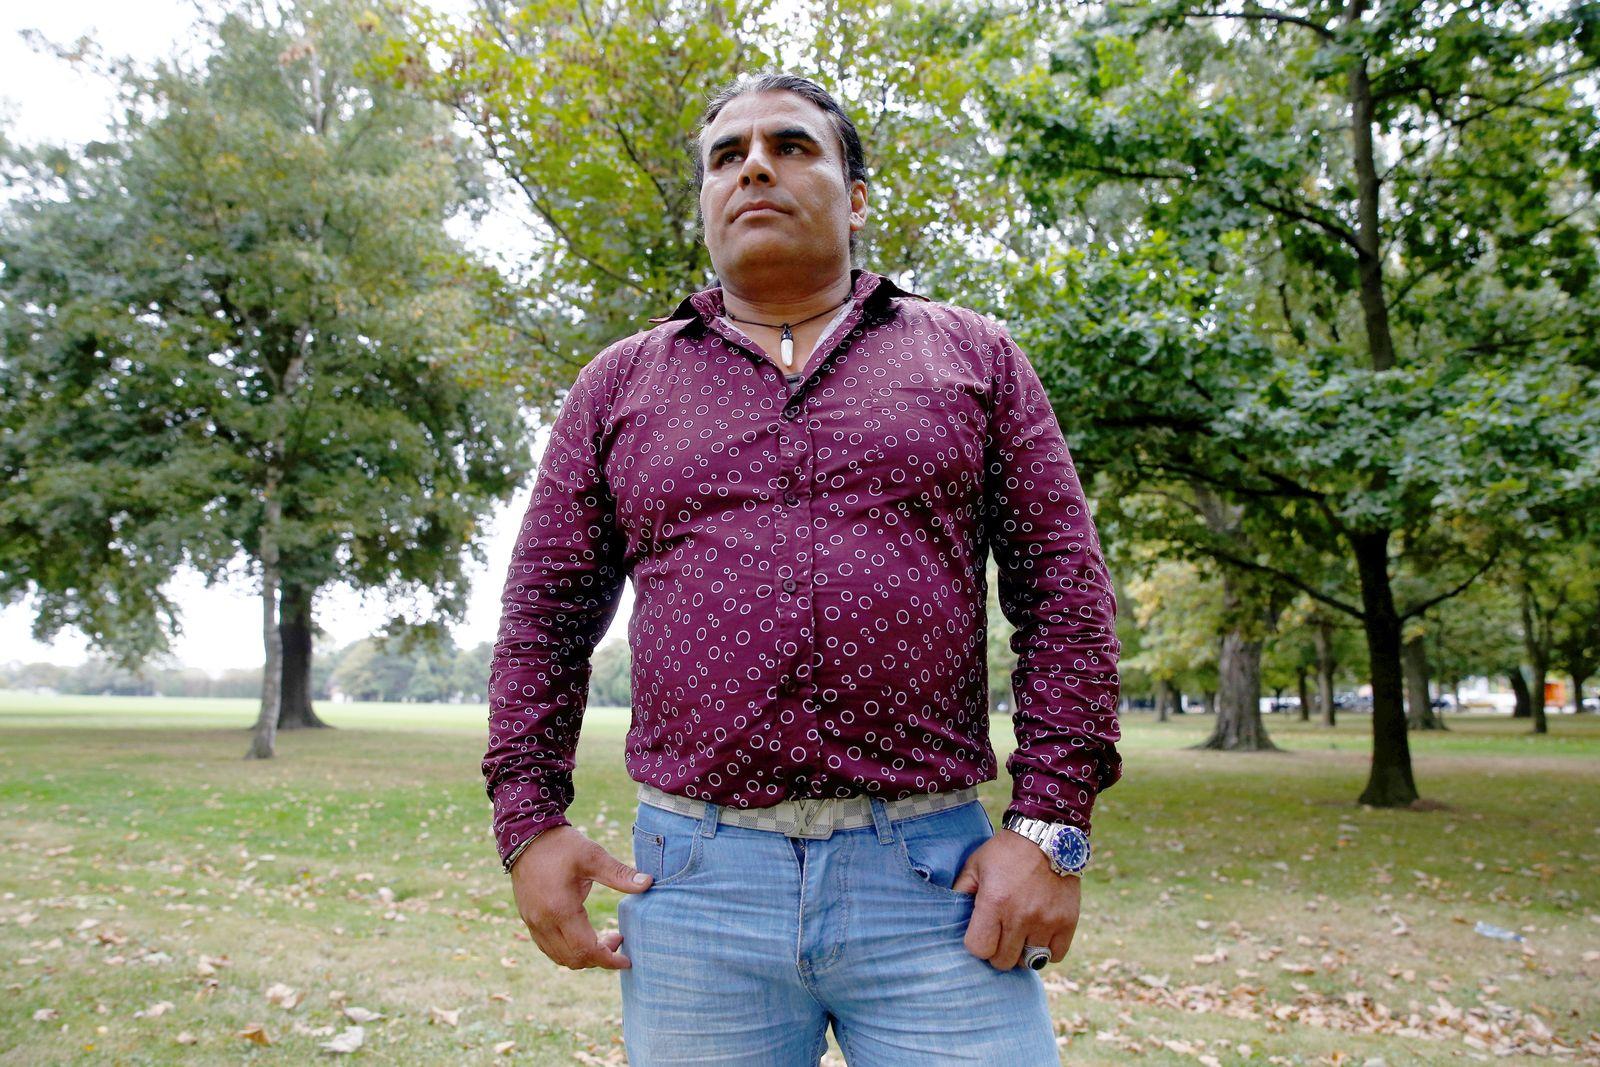 Abdul Aziz/ Terror/ Christchurch